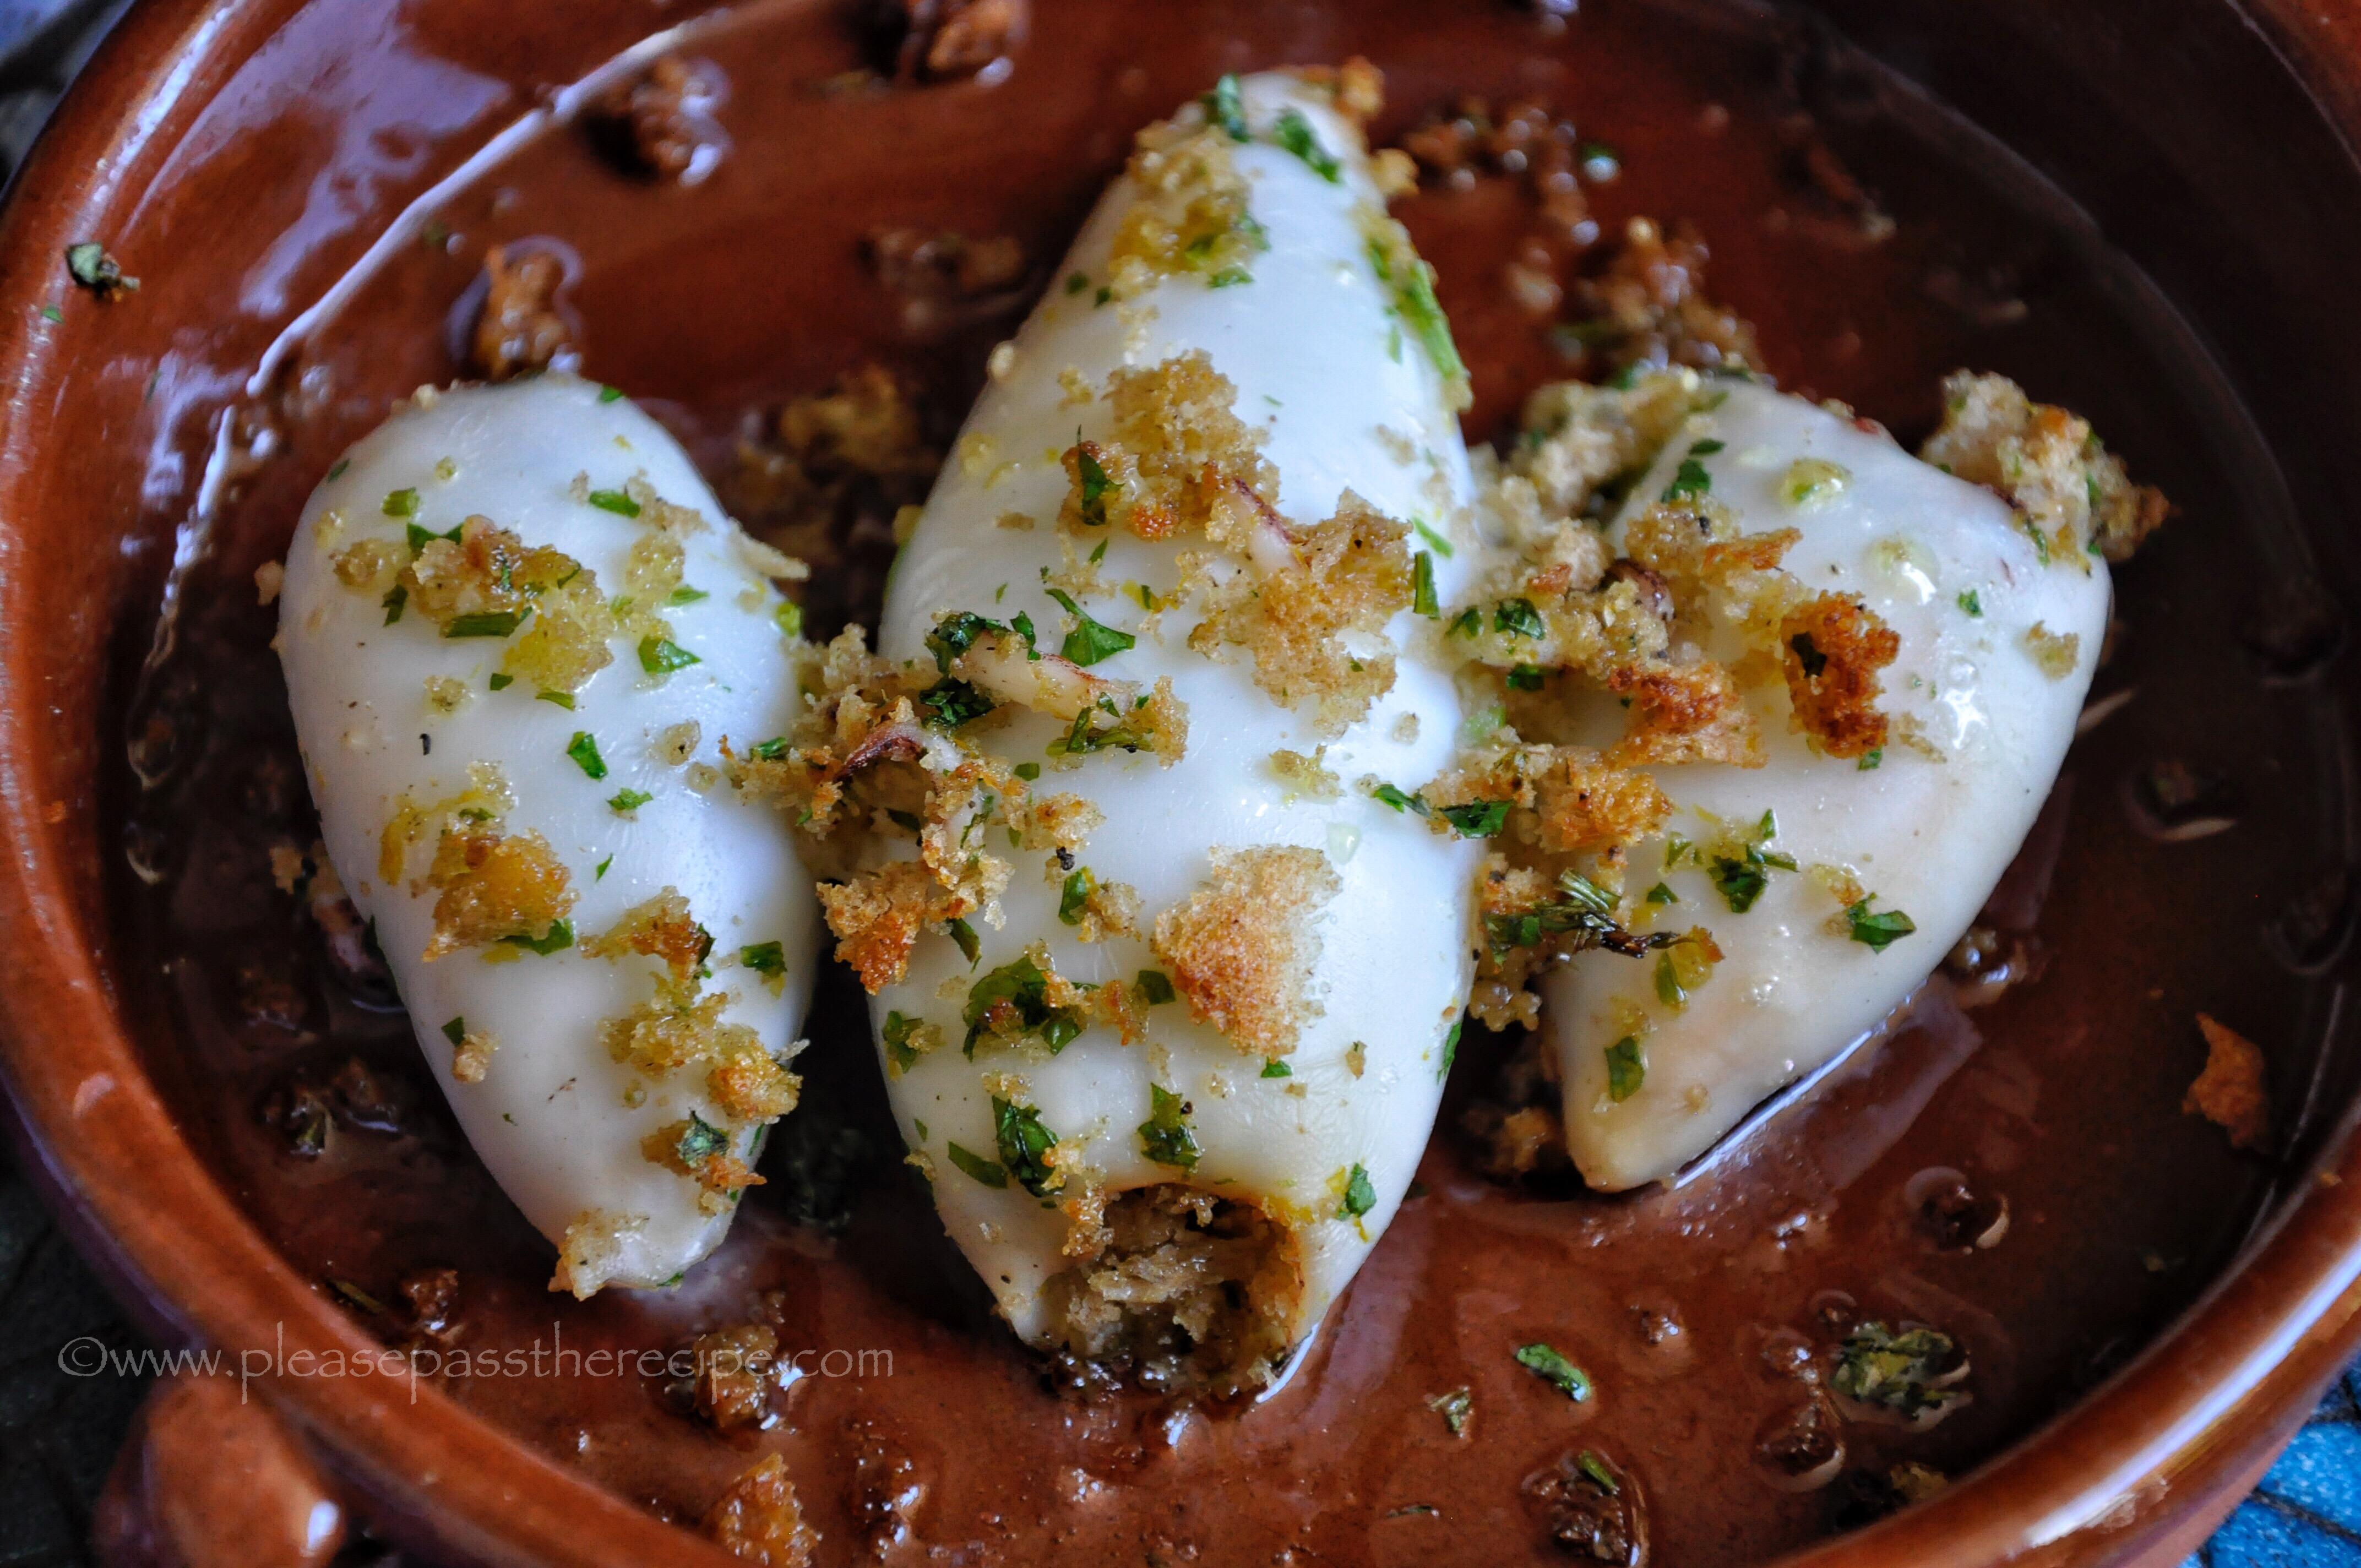 Baked Stuffed Calamari  Please Pass the Recipe